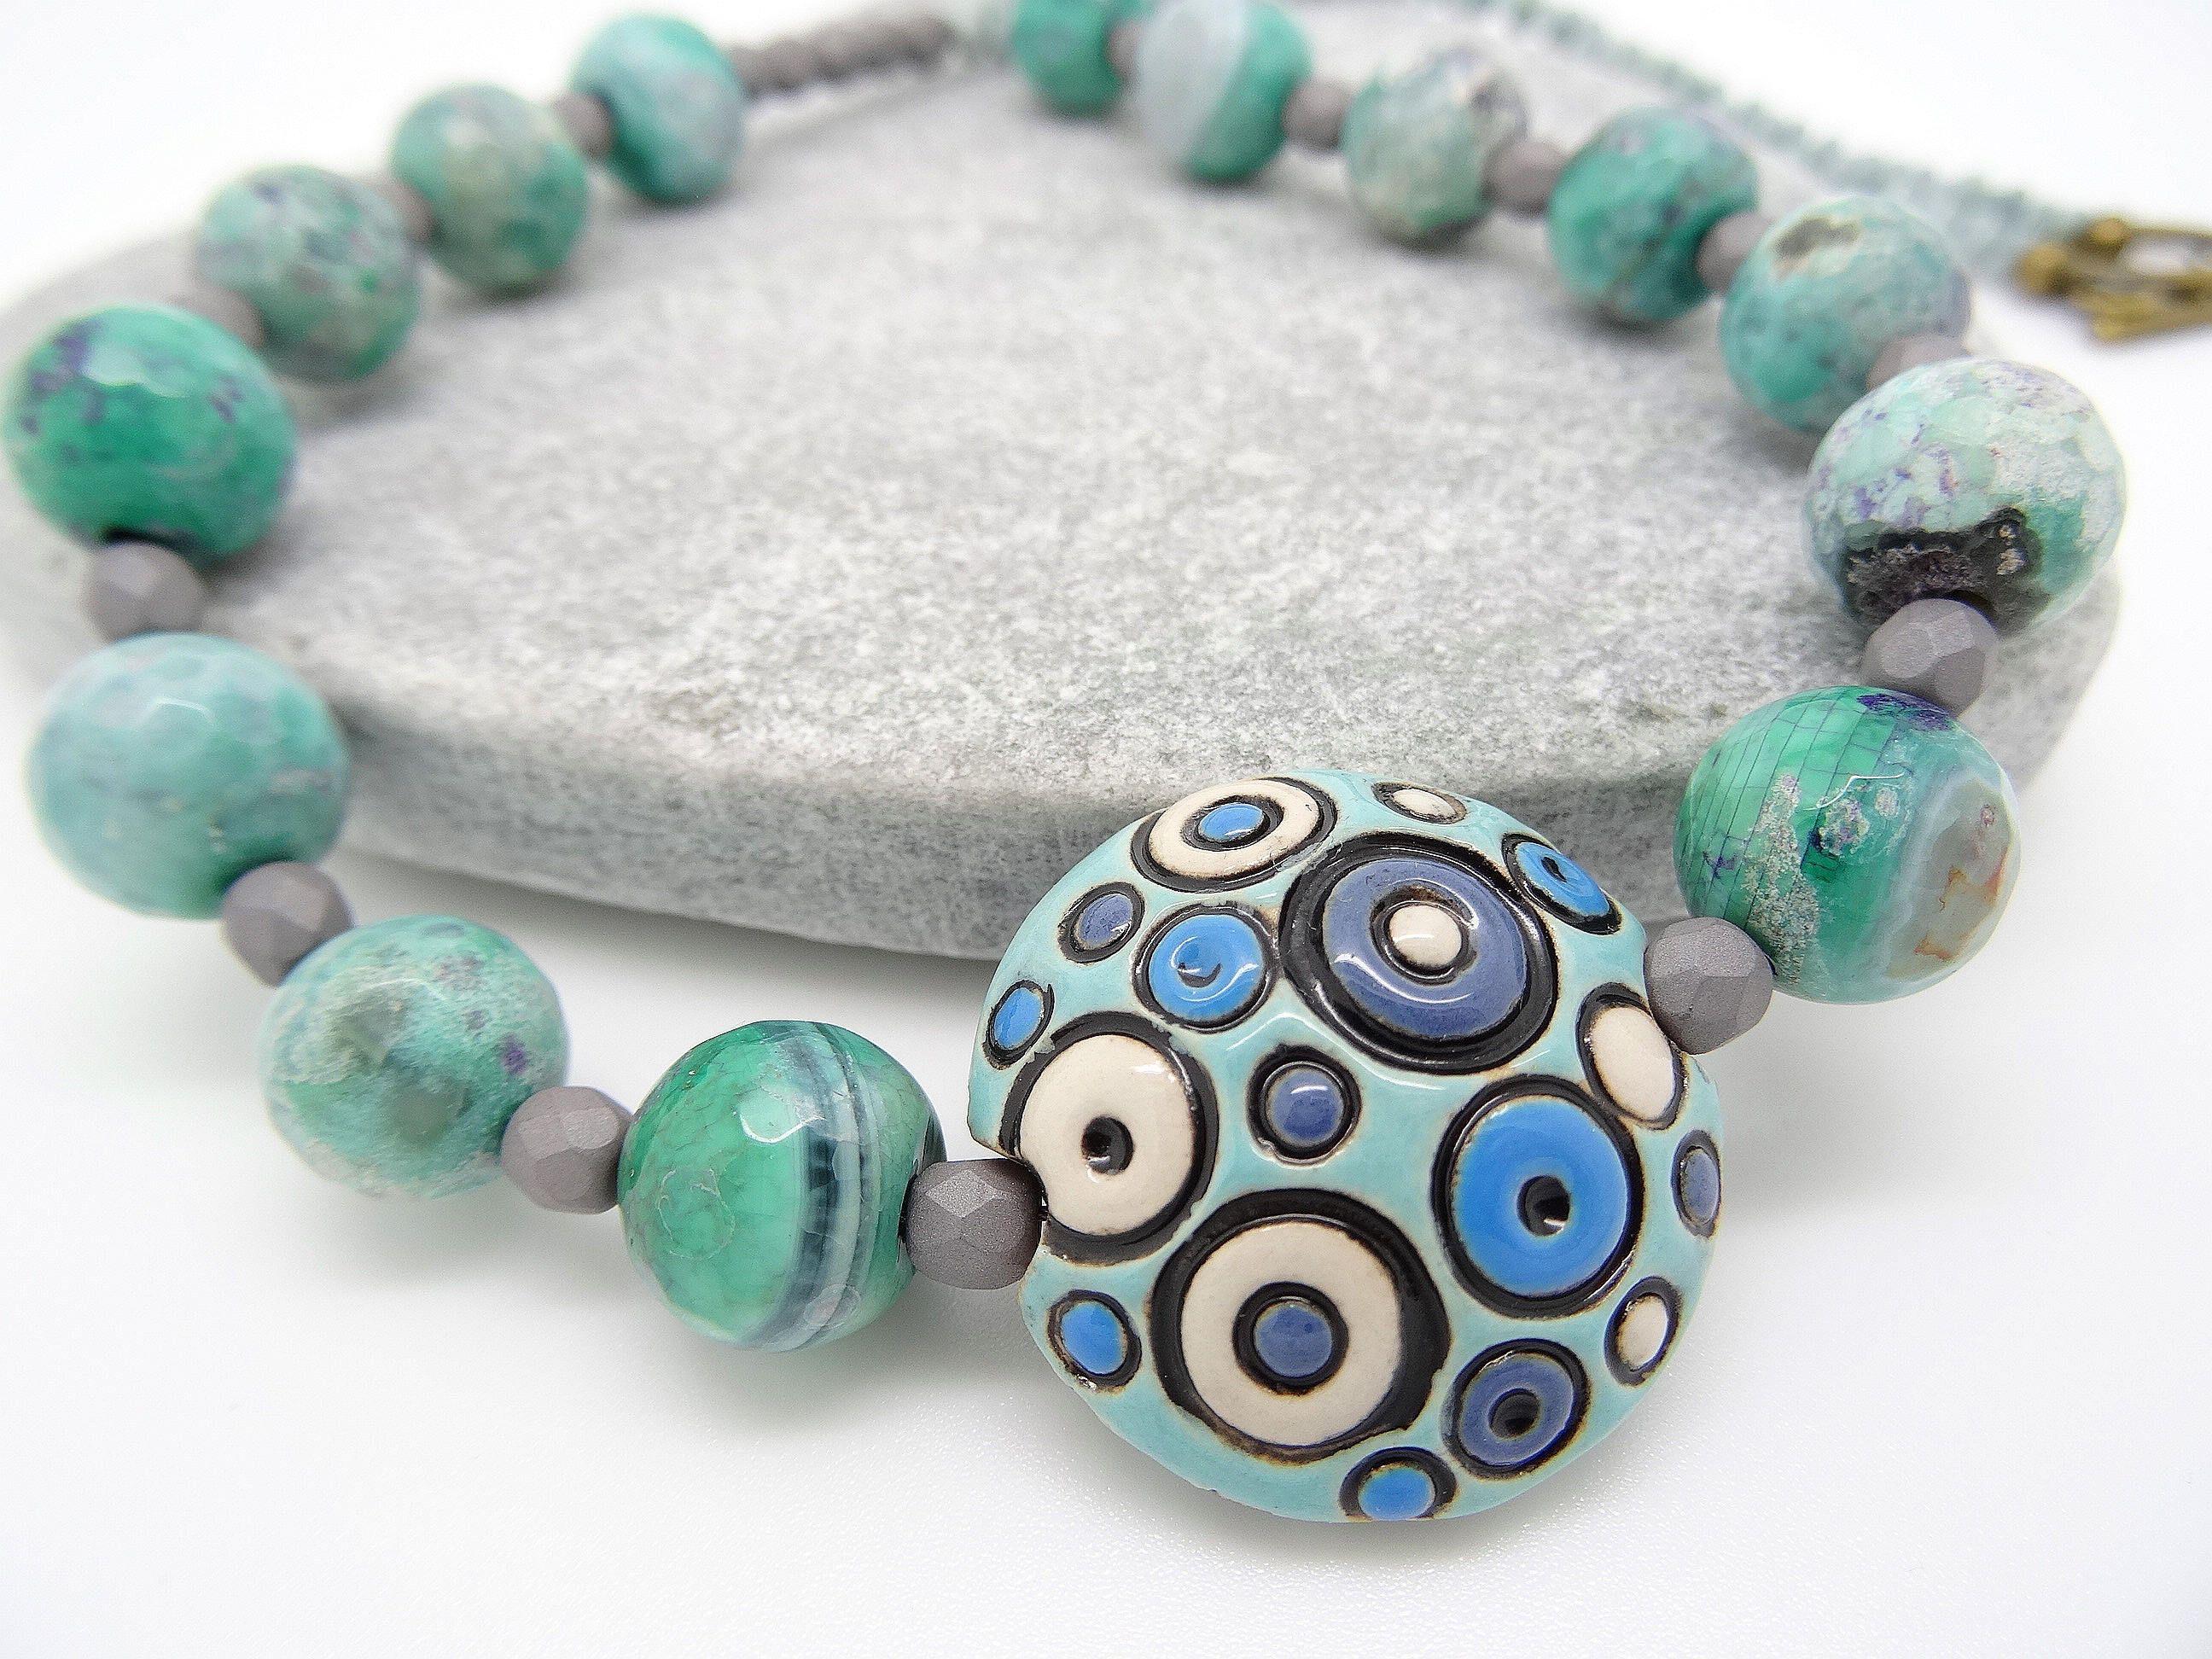 fire agate necklace ceramic necklace czech glass necklace blue